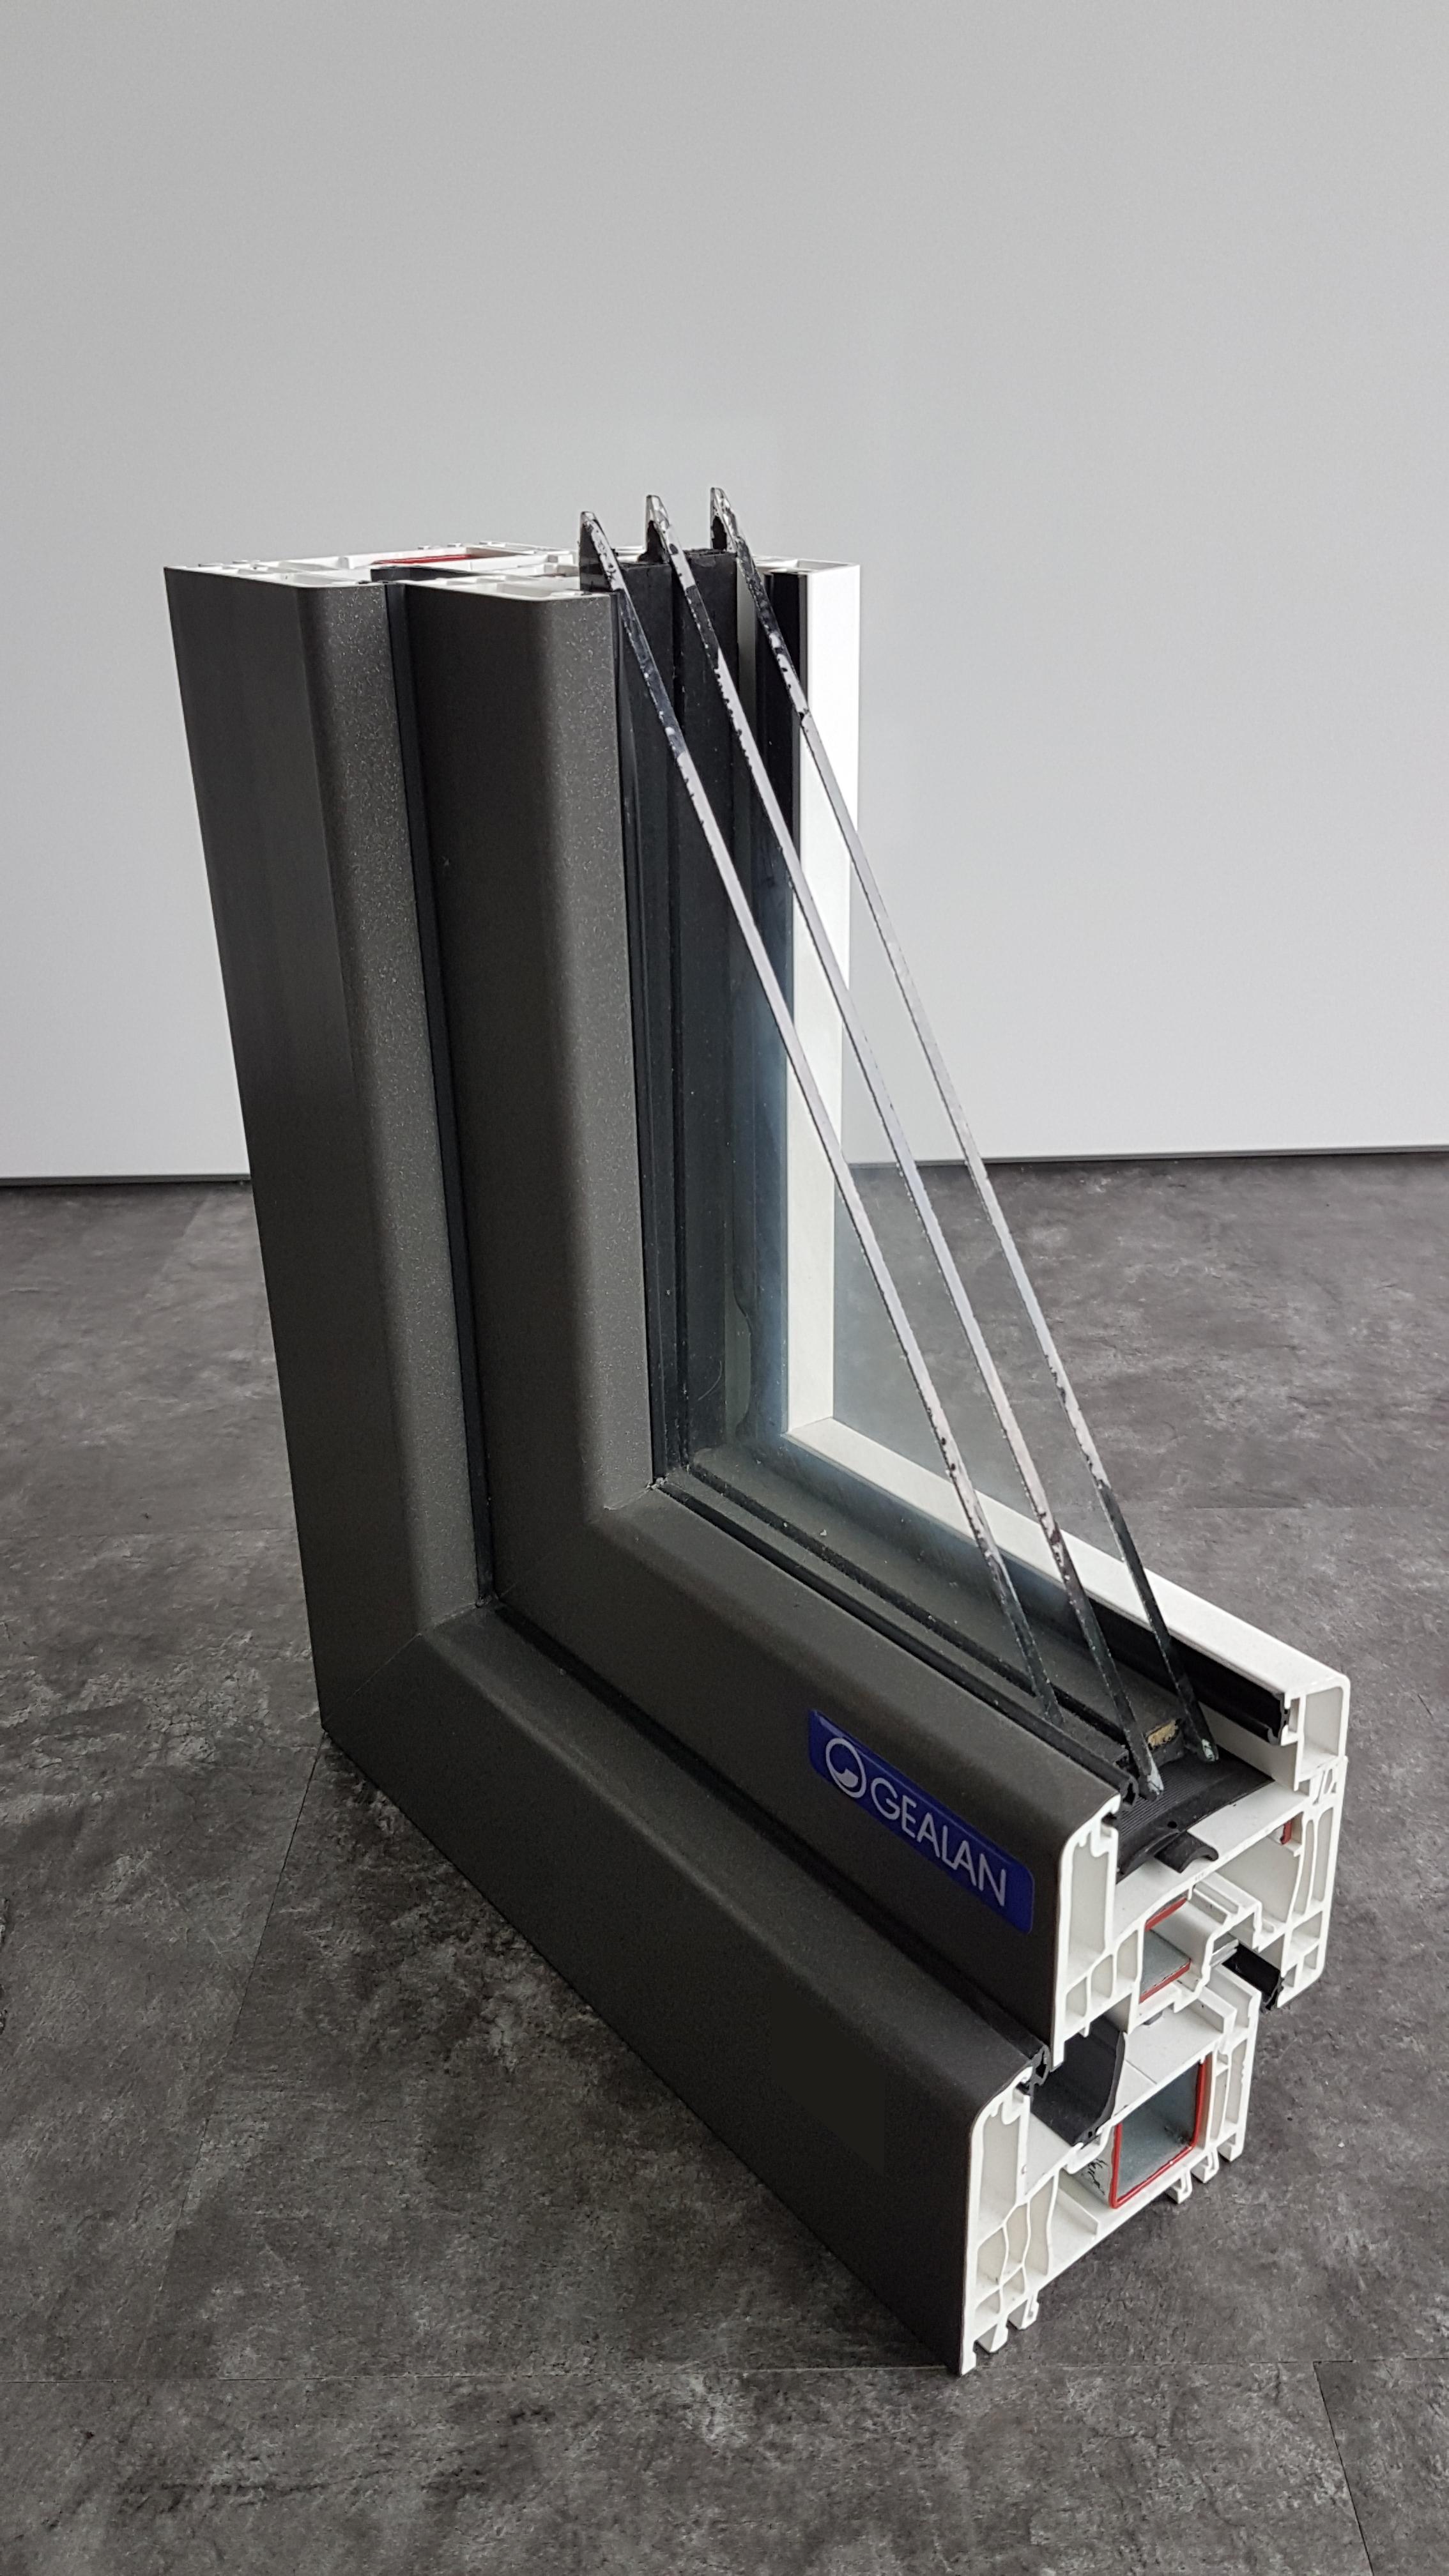 kunststofffenster holzfenster und aluminiumfenster. Black Bedroom Furniture Sets. Home Design Ideas